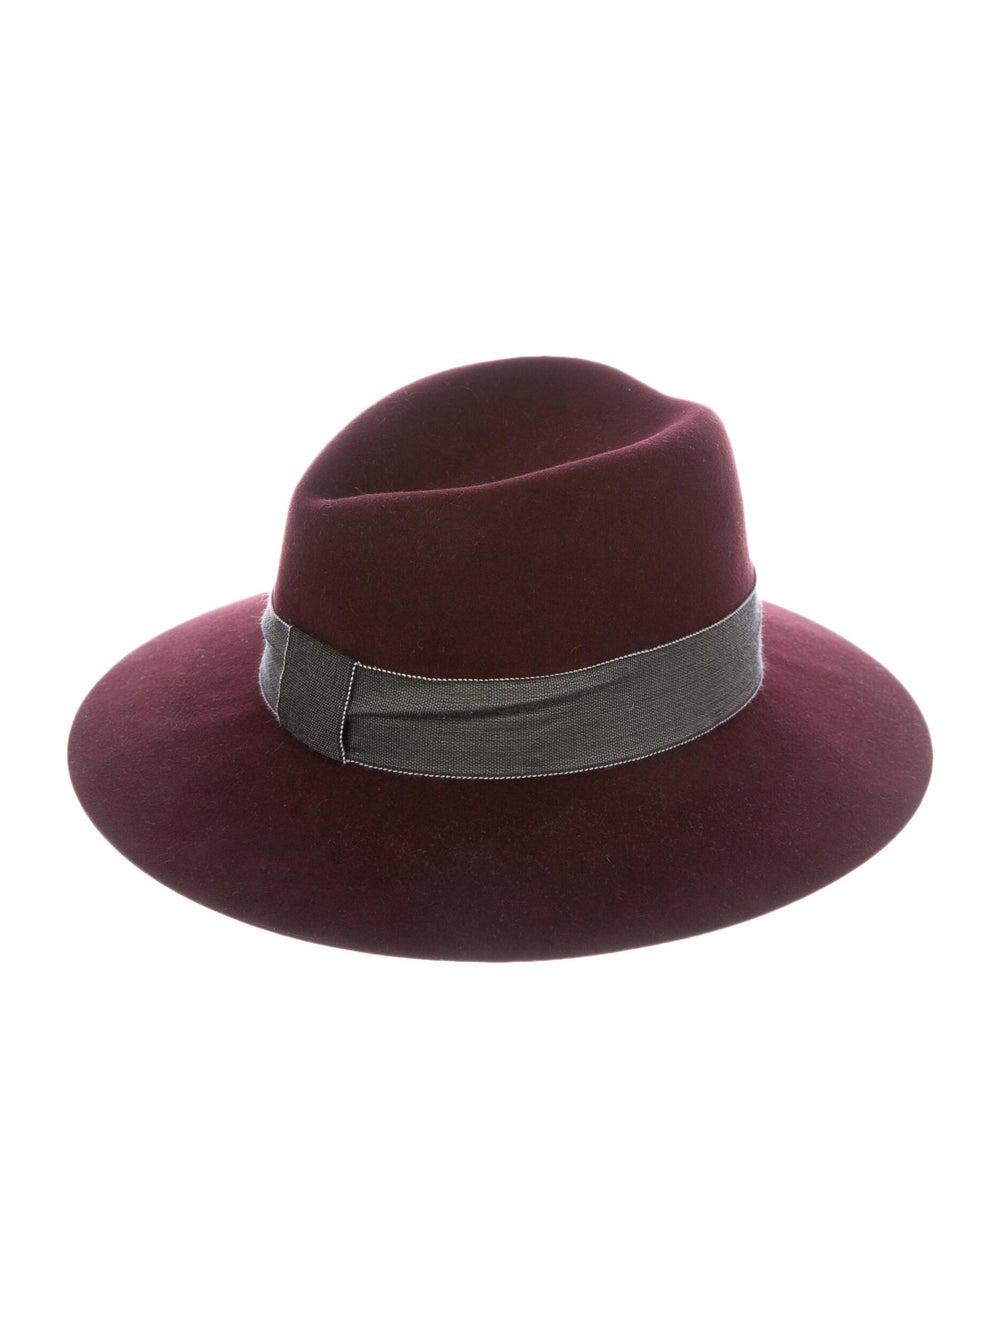 Maison Michel Fedora Hat w/ Tags - image 2